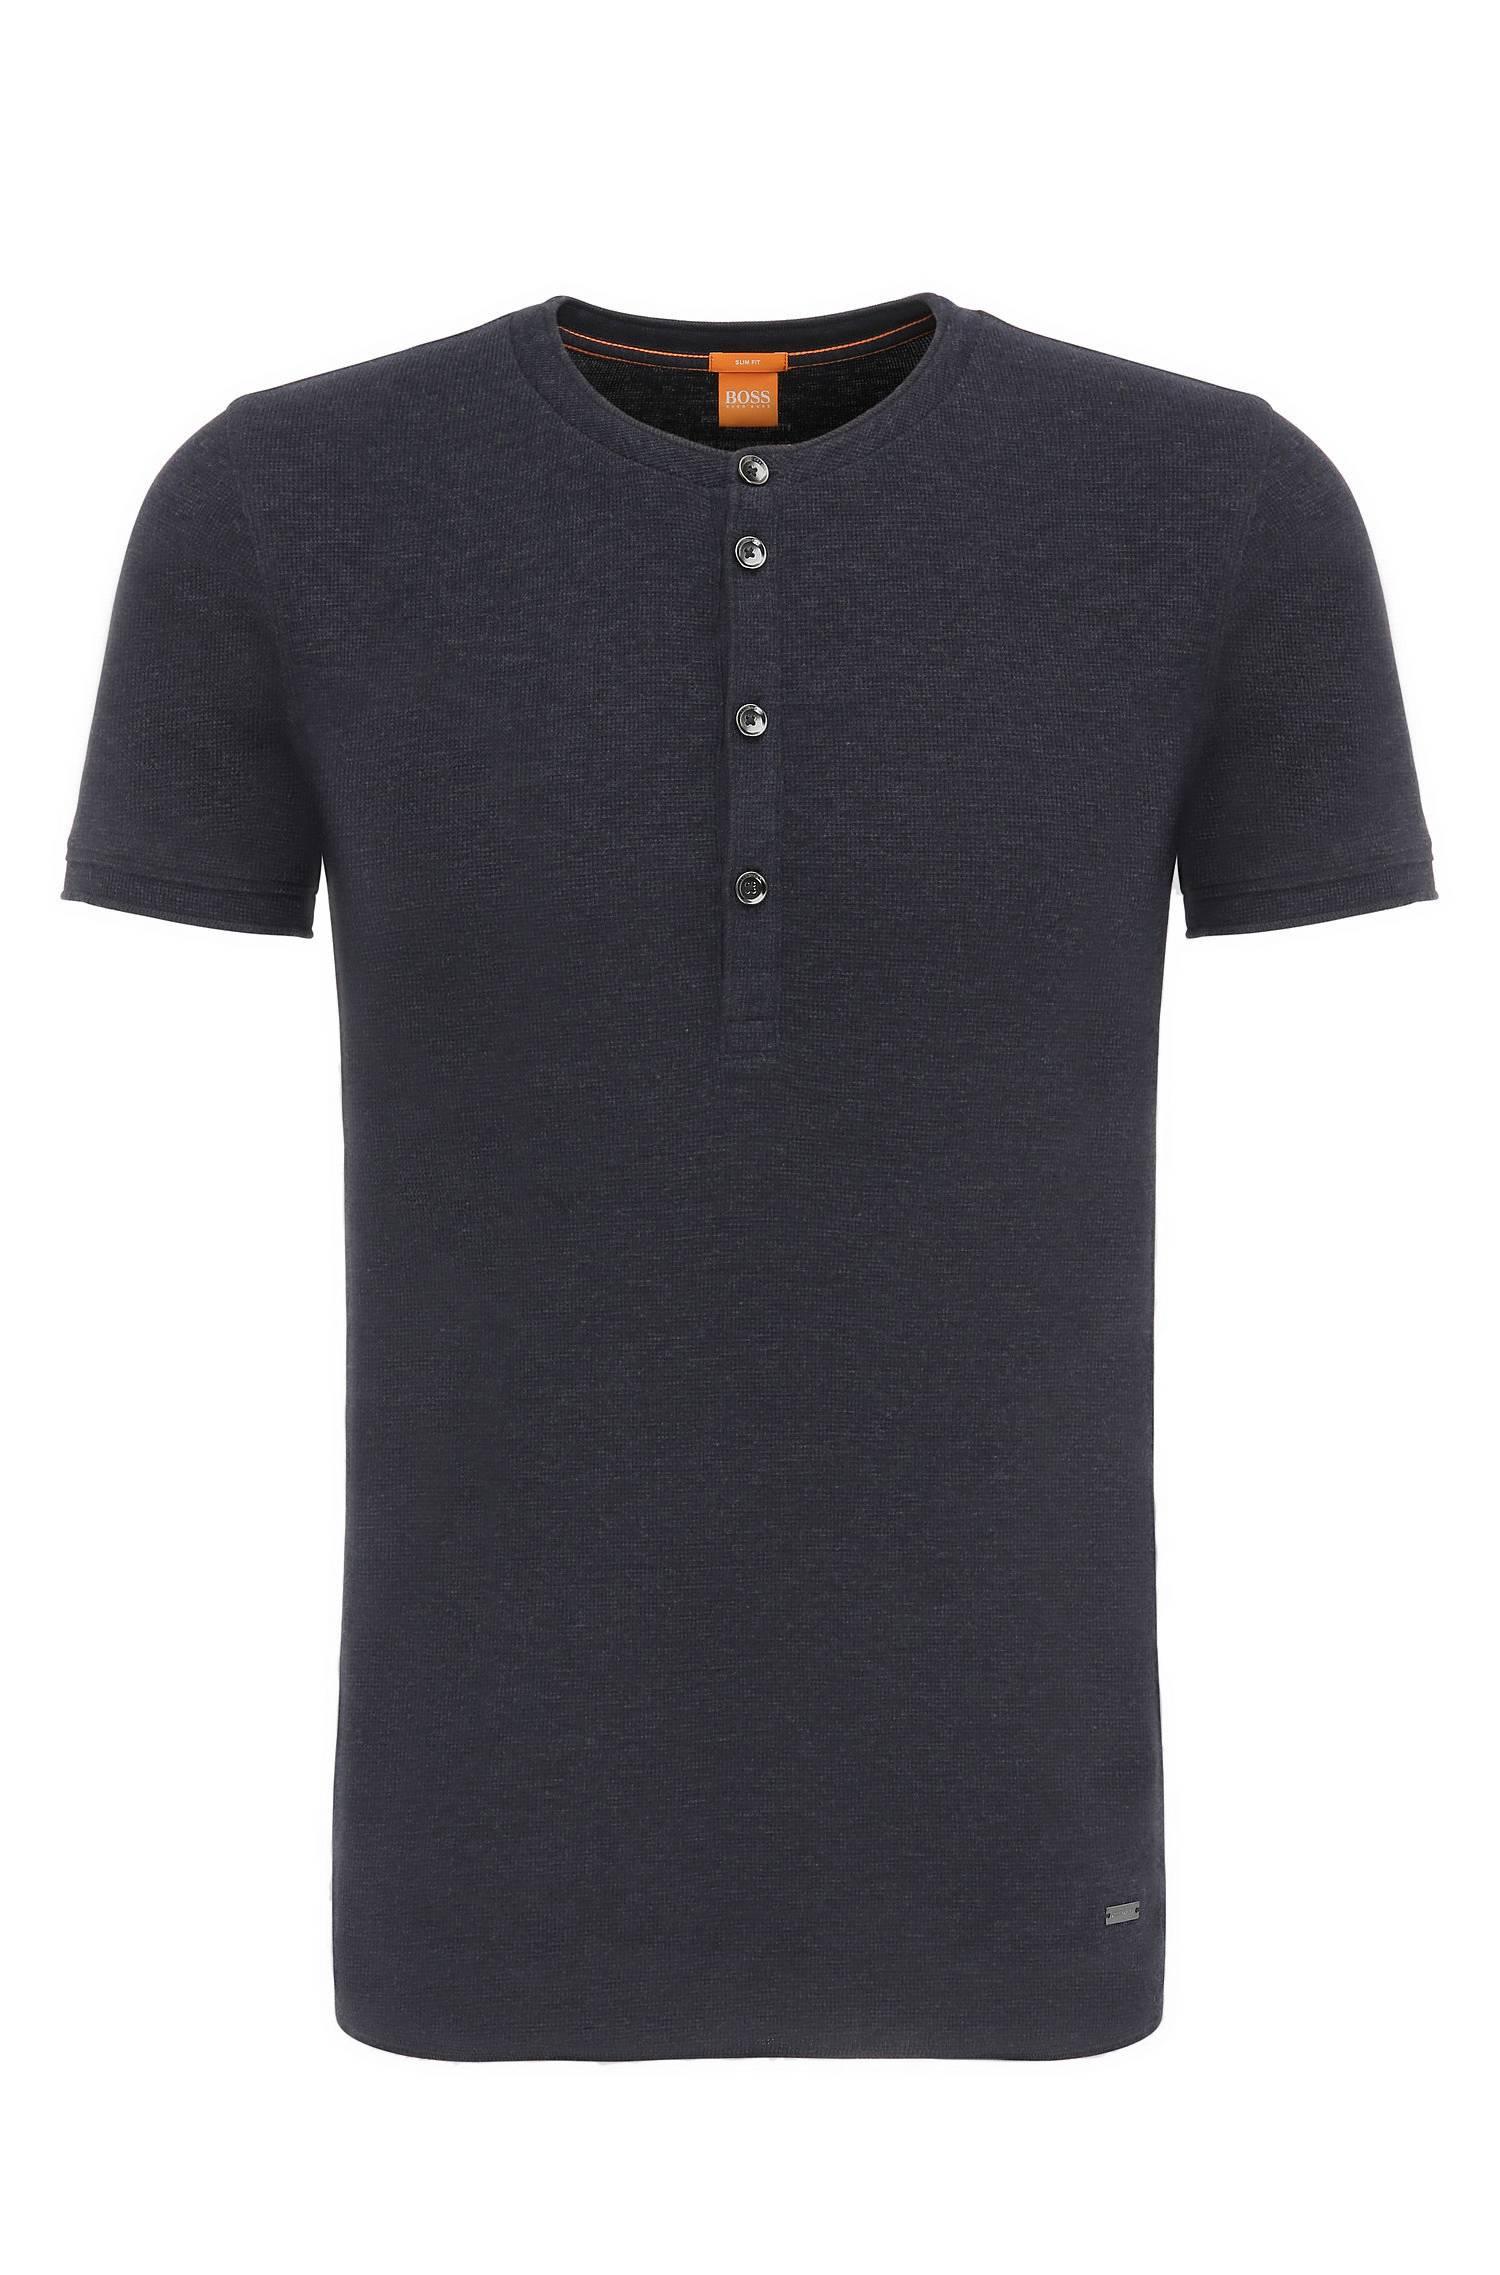 Slimfit Henley shirt in cotton `Topside`